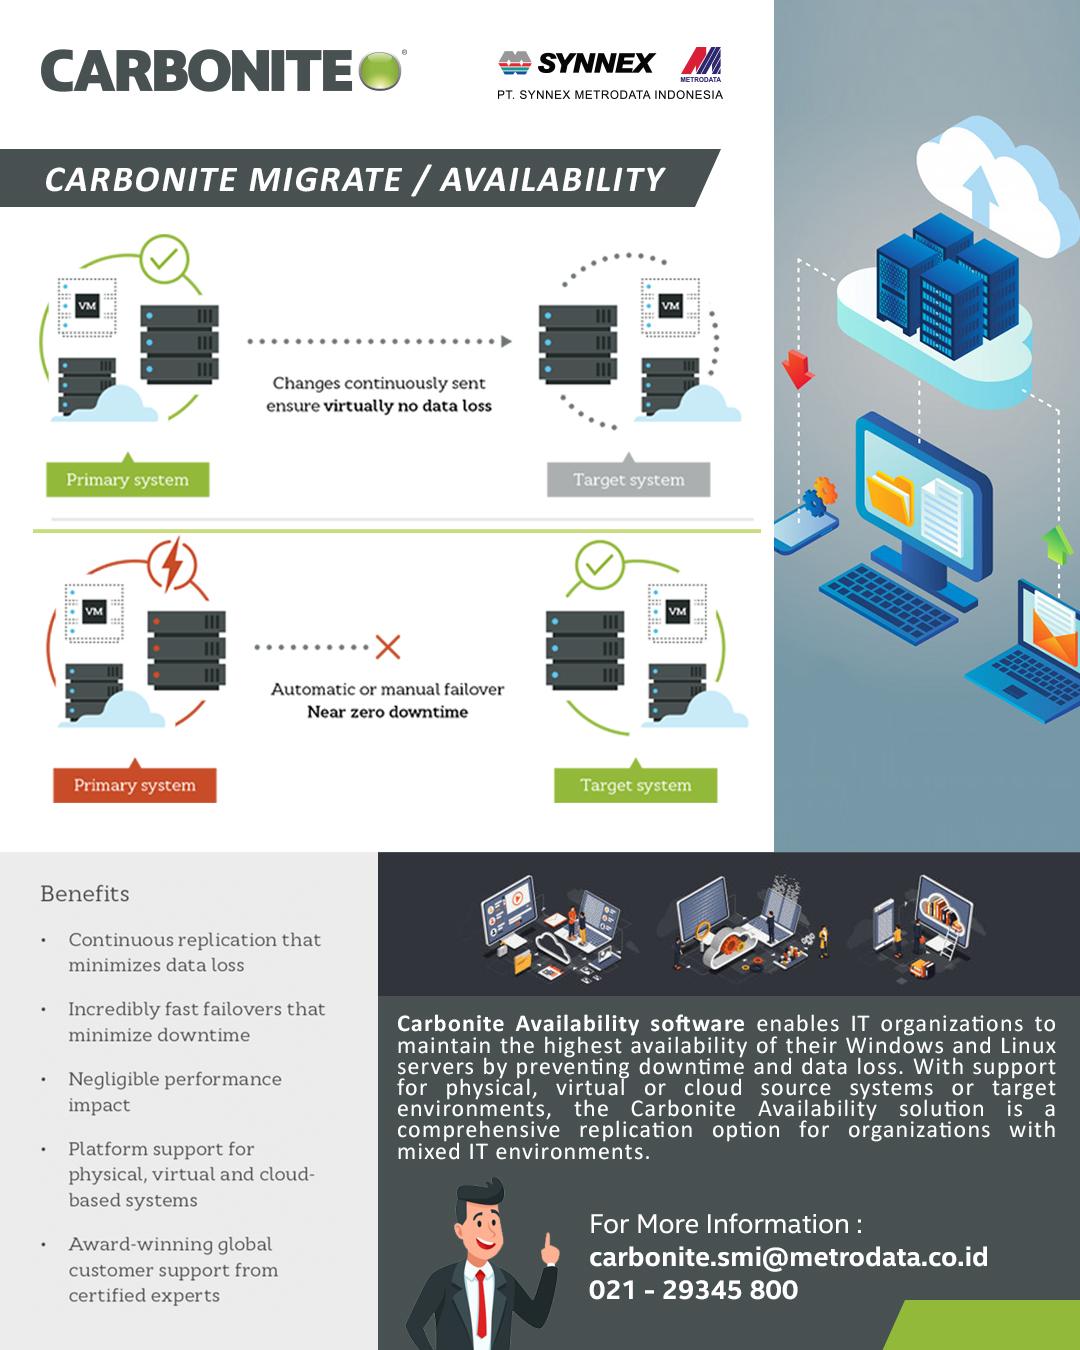 https://www.synnexmetrodata.com/wp-content/uploads/2021/06/Carbonite-Availability.jpg